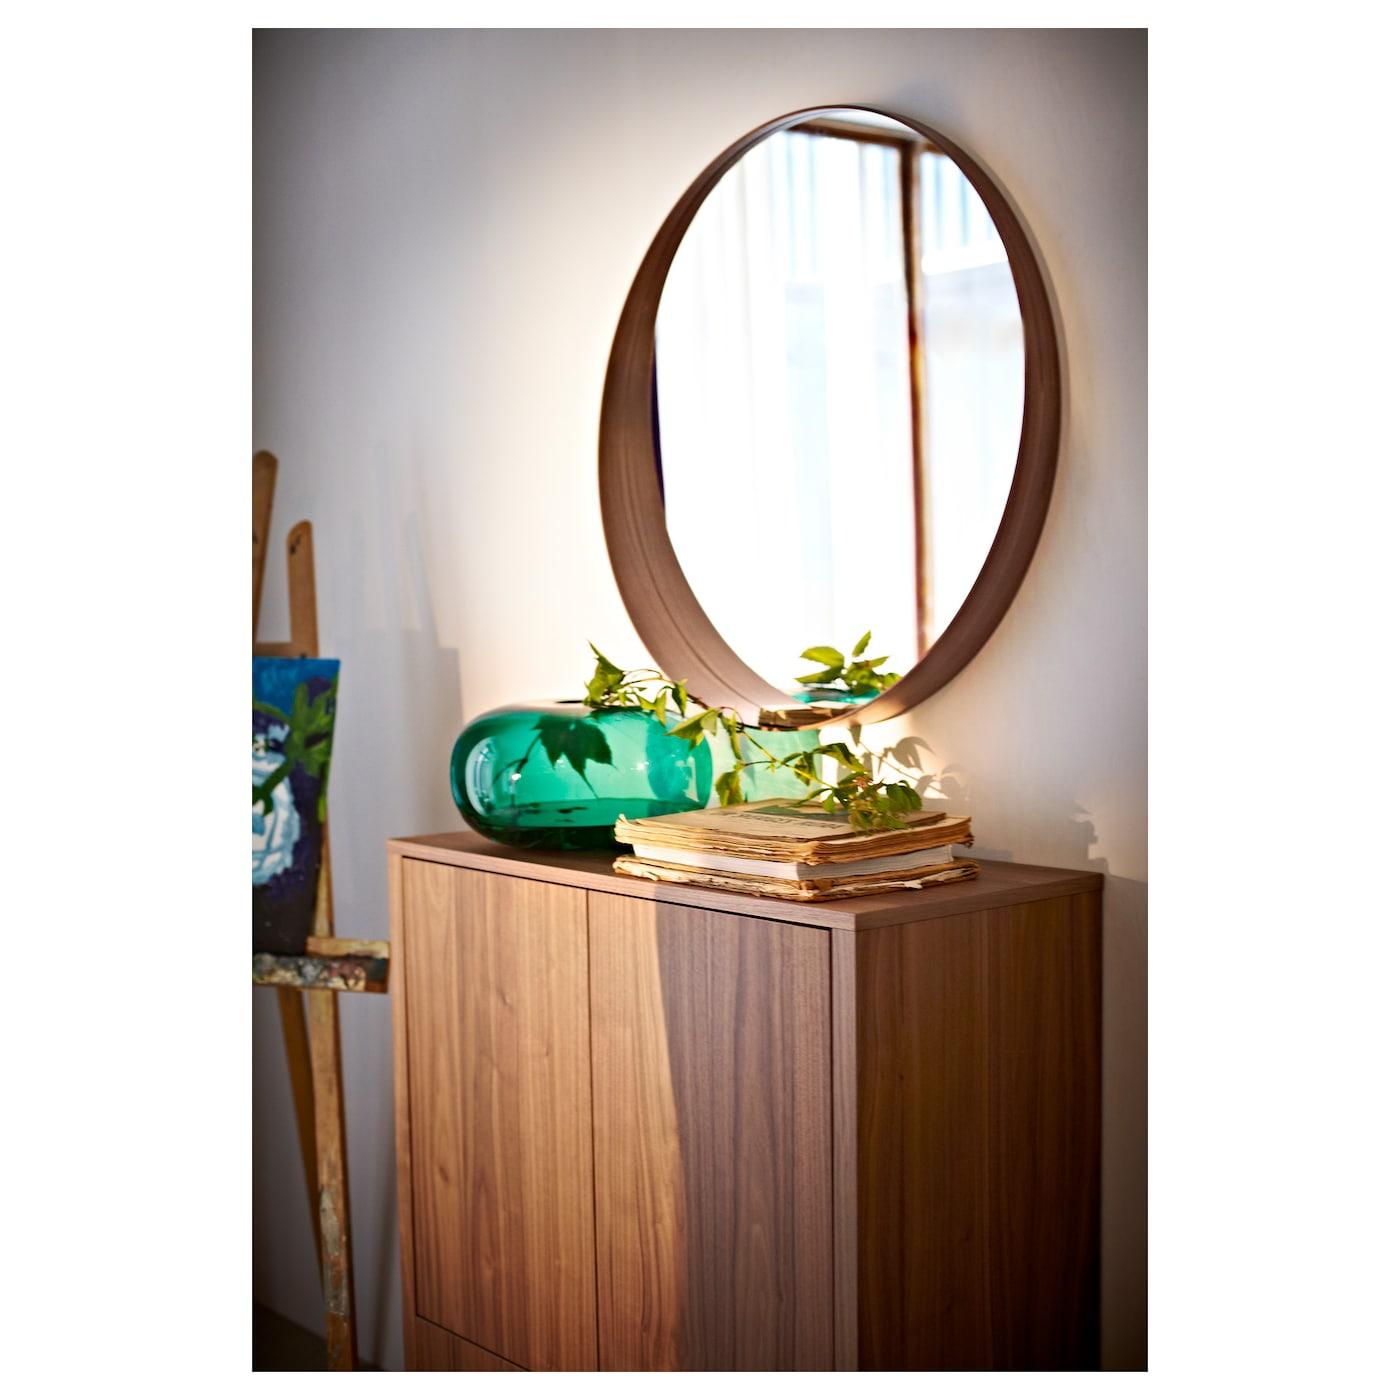 STOCKHOLM Mirror Walnut veneer 80 cm IKEA